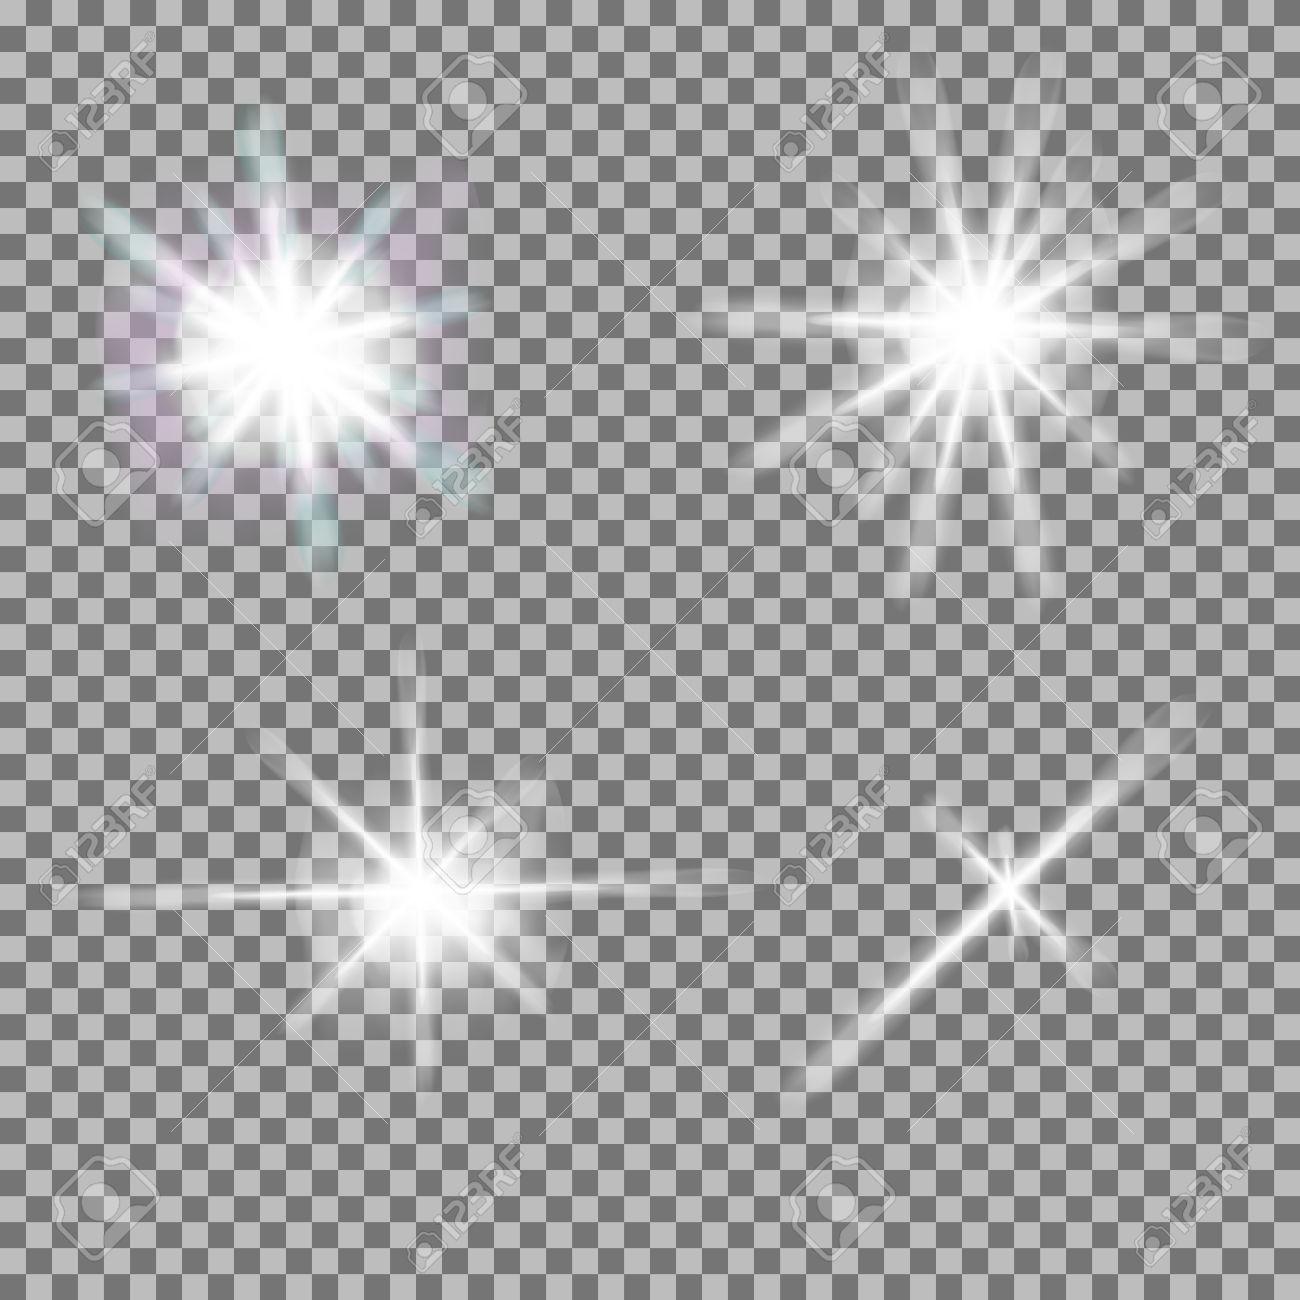 Light burst clipart transparent background.